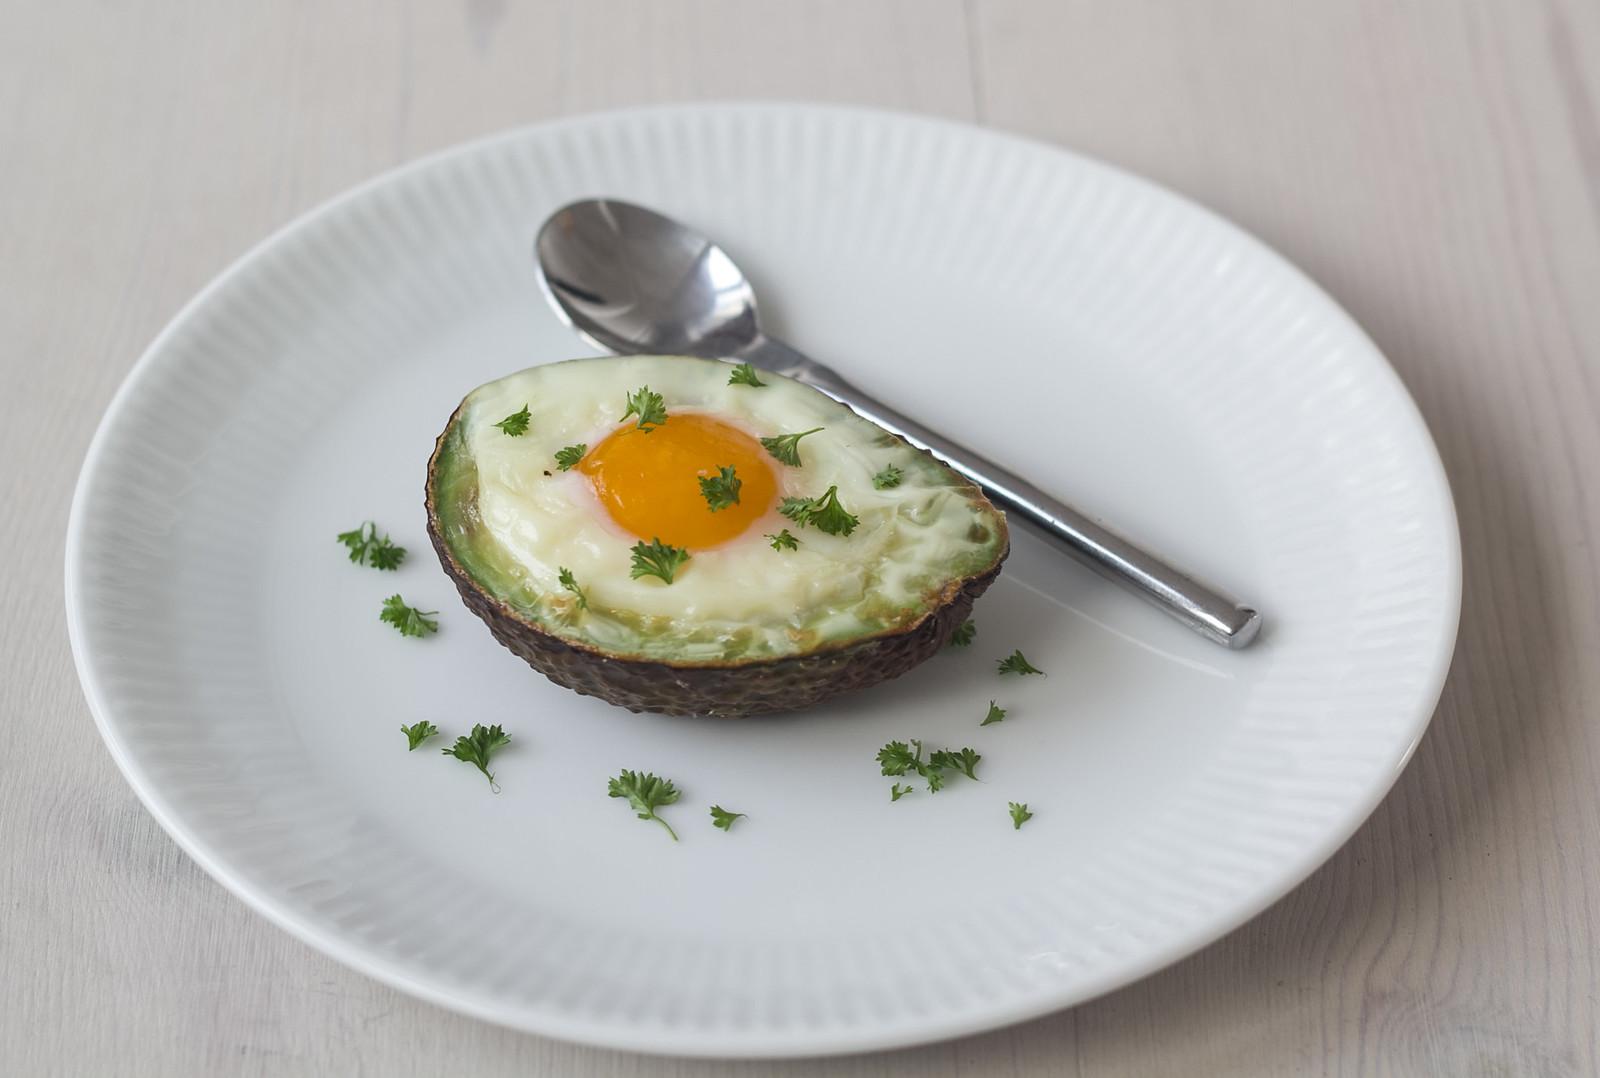 Recipe for Homemade Avocado Baked Egg